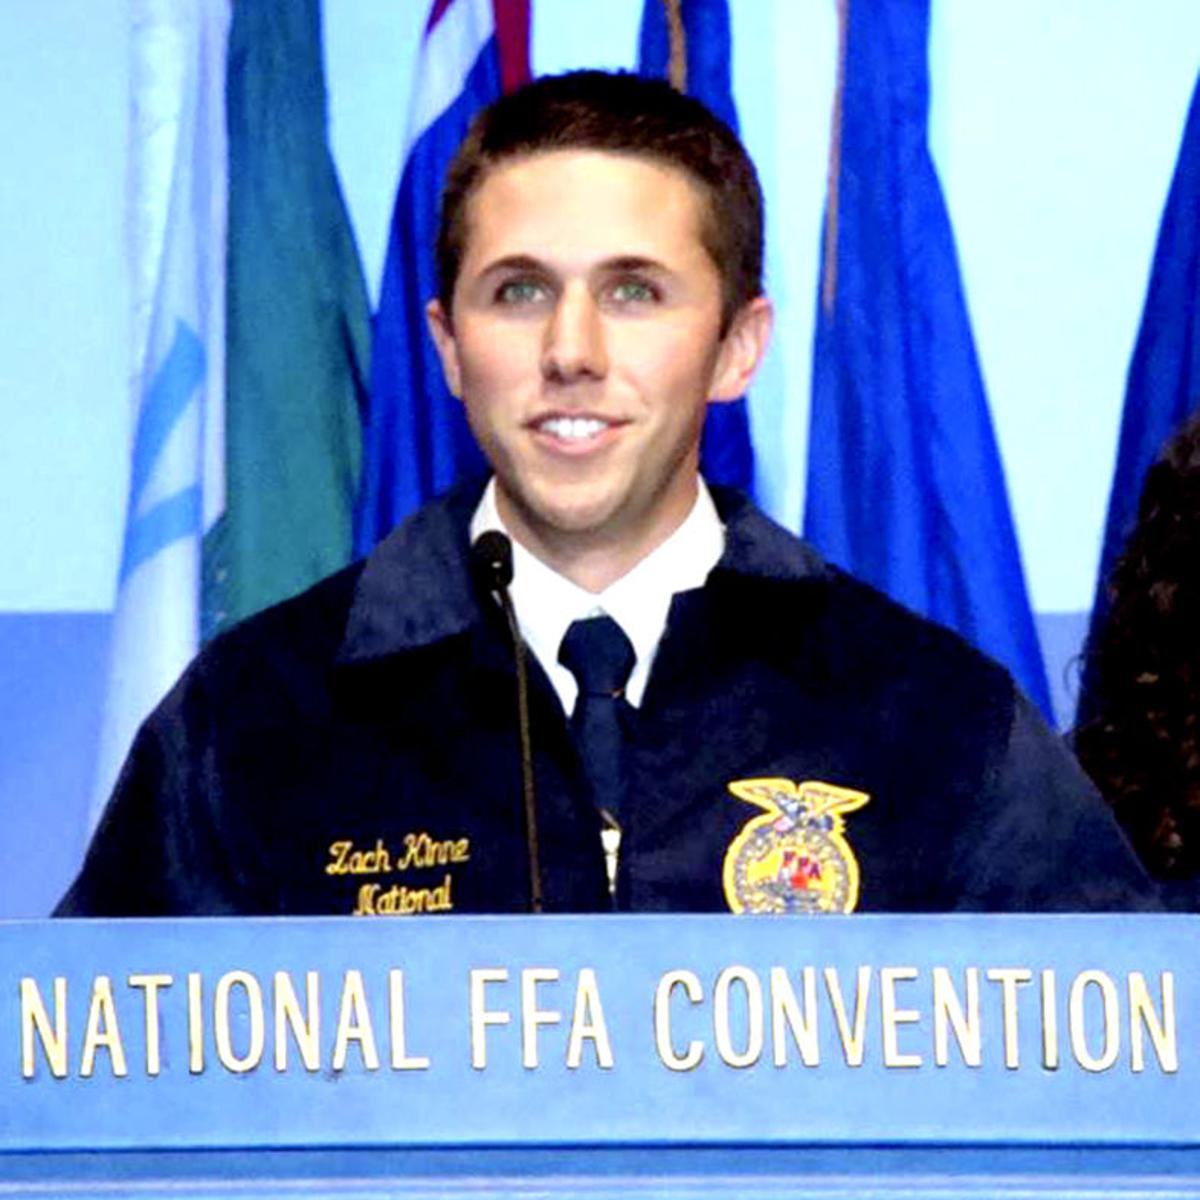 national ffa convention 2020